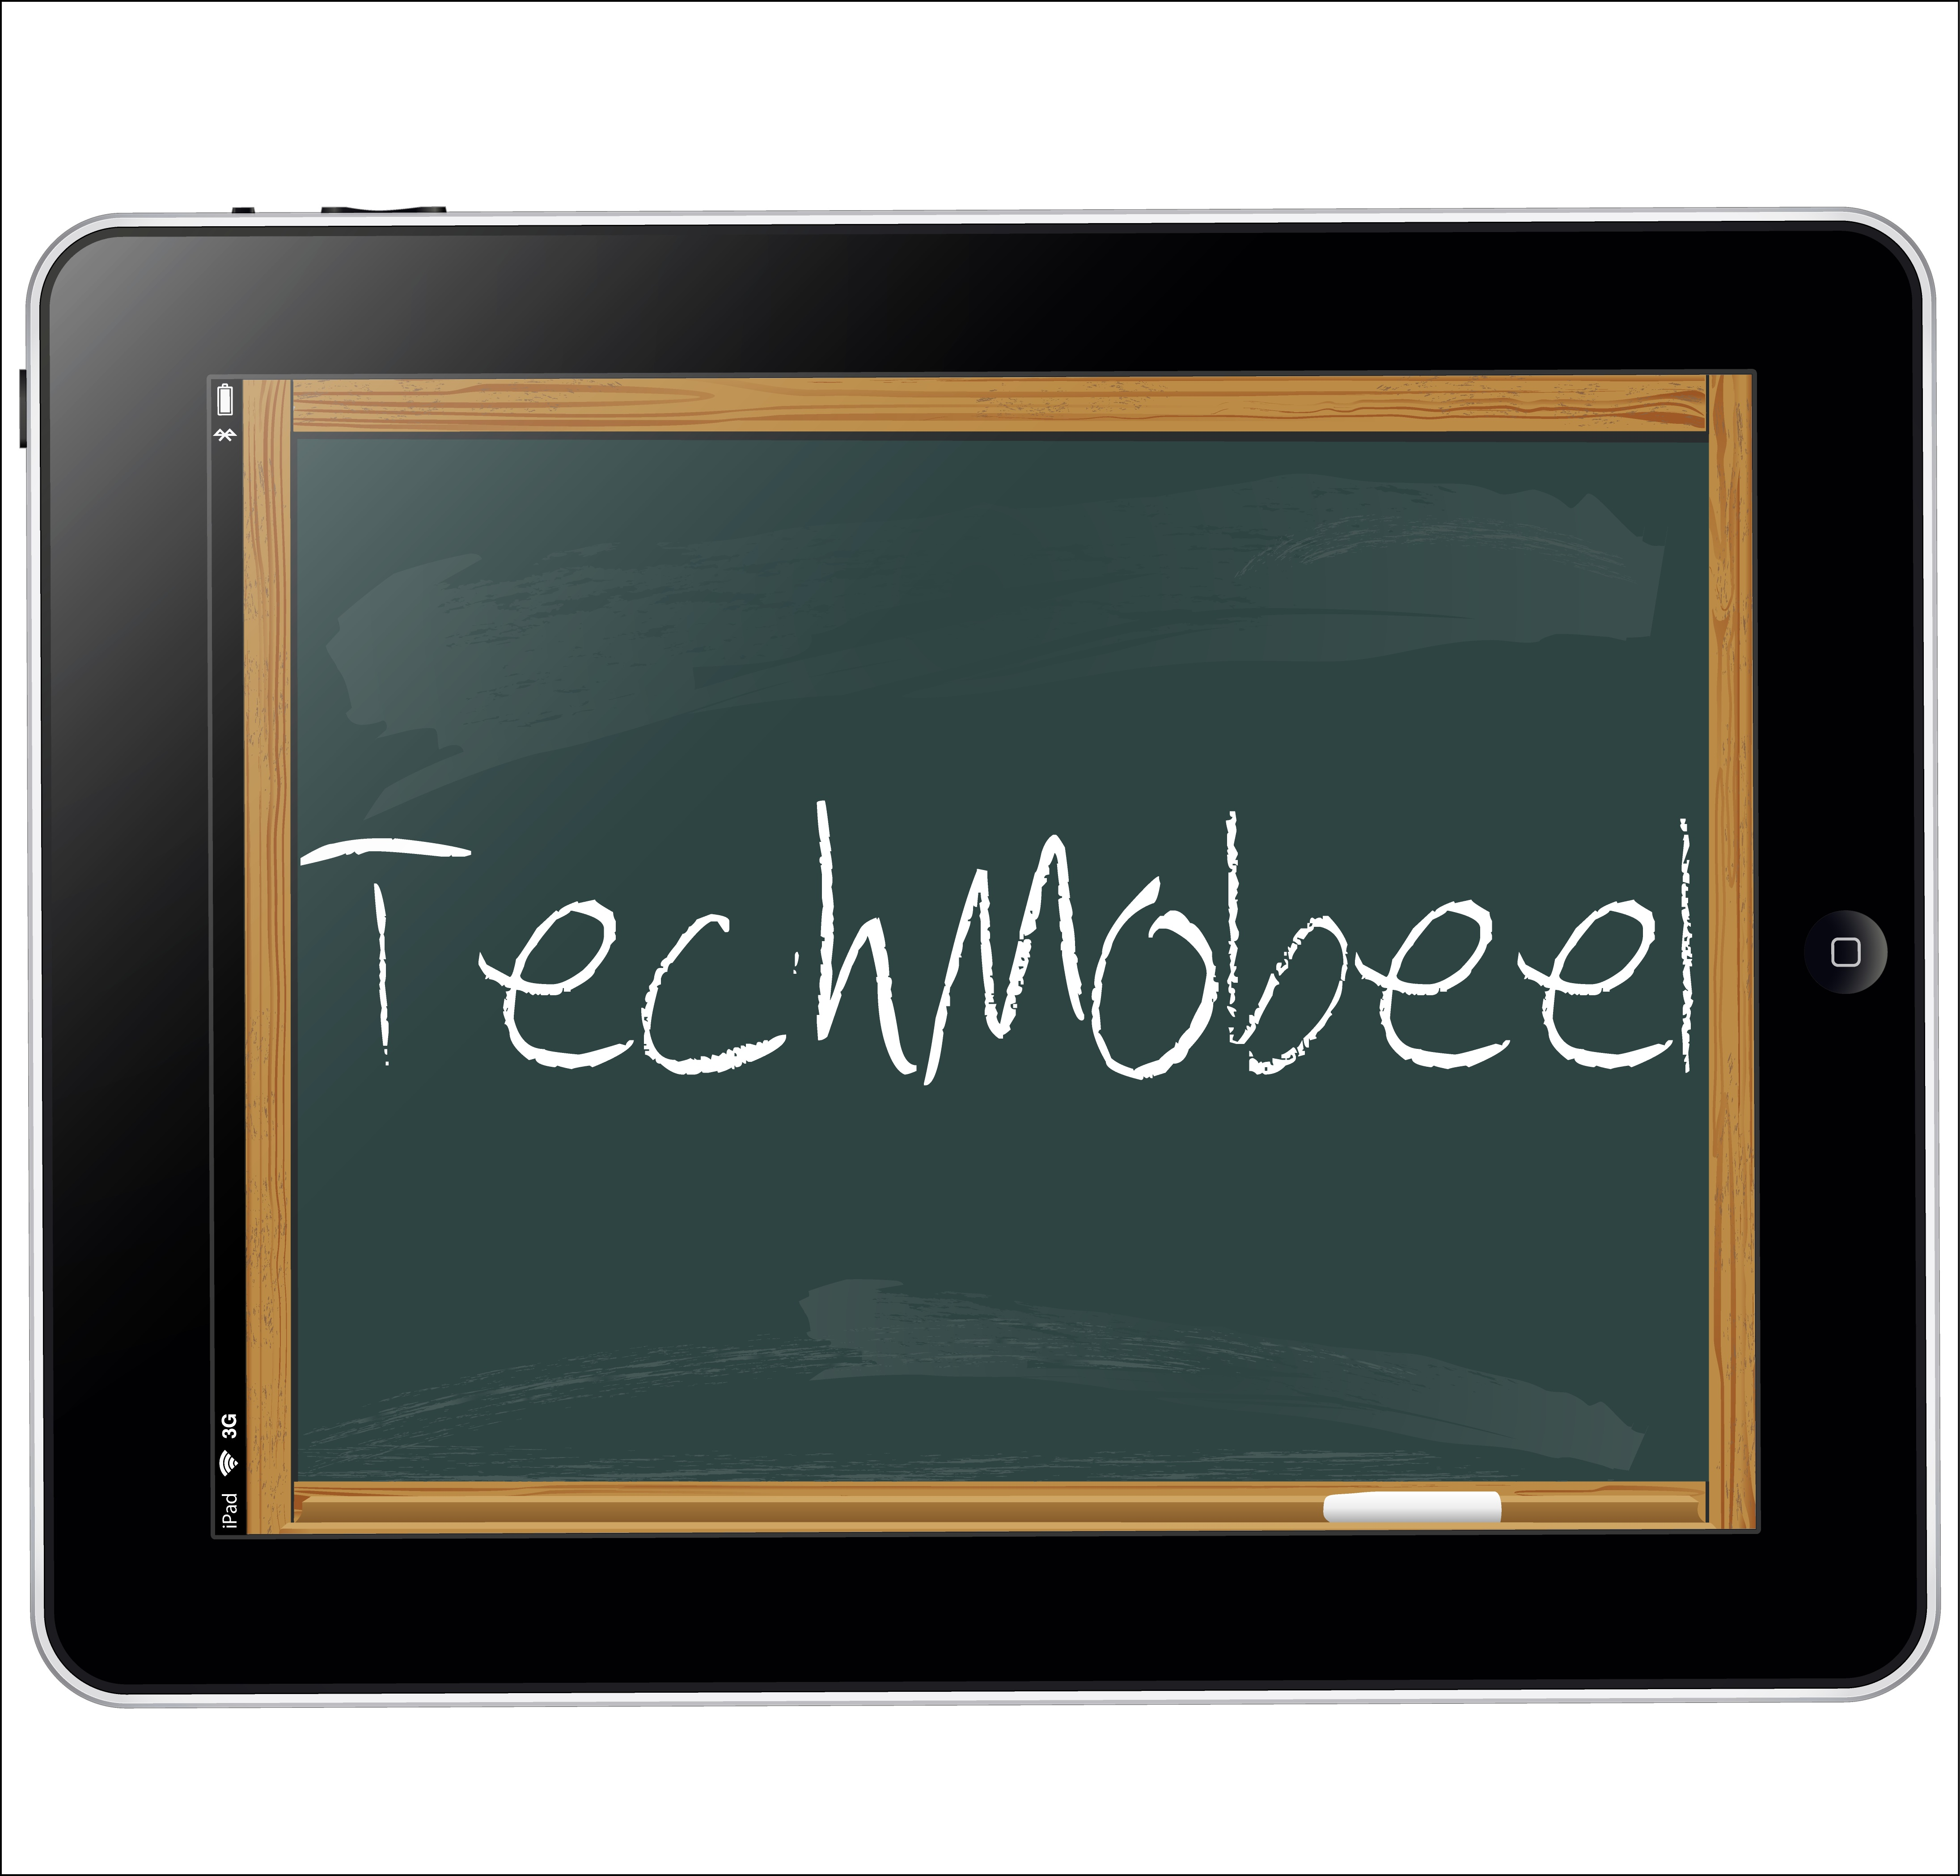 Techmobeel to the Rescue!